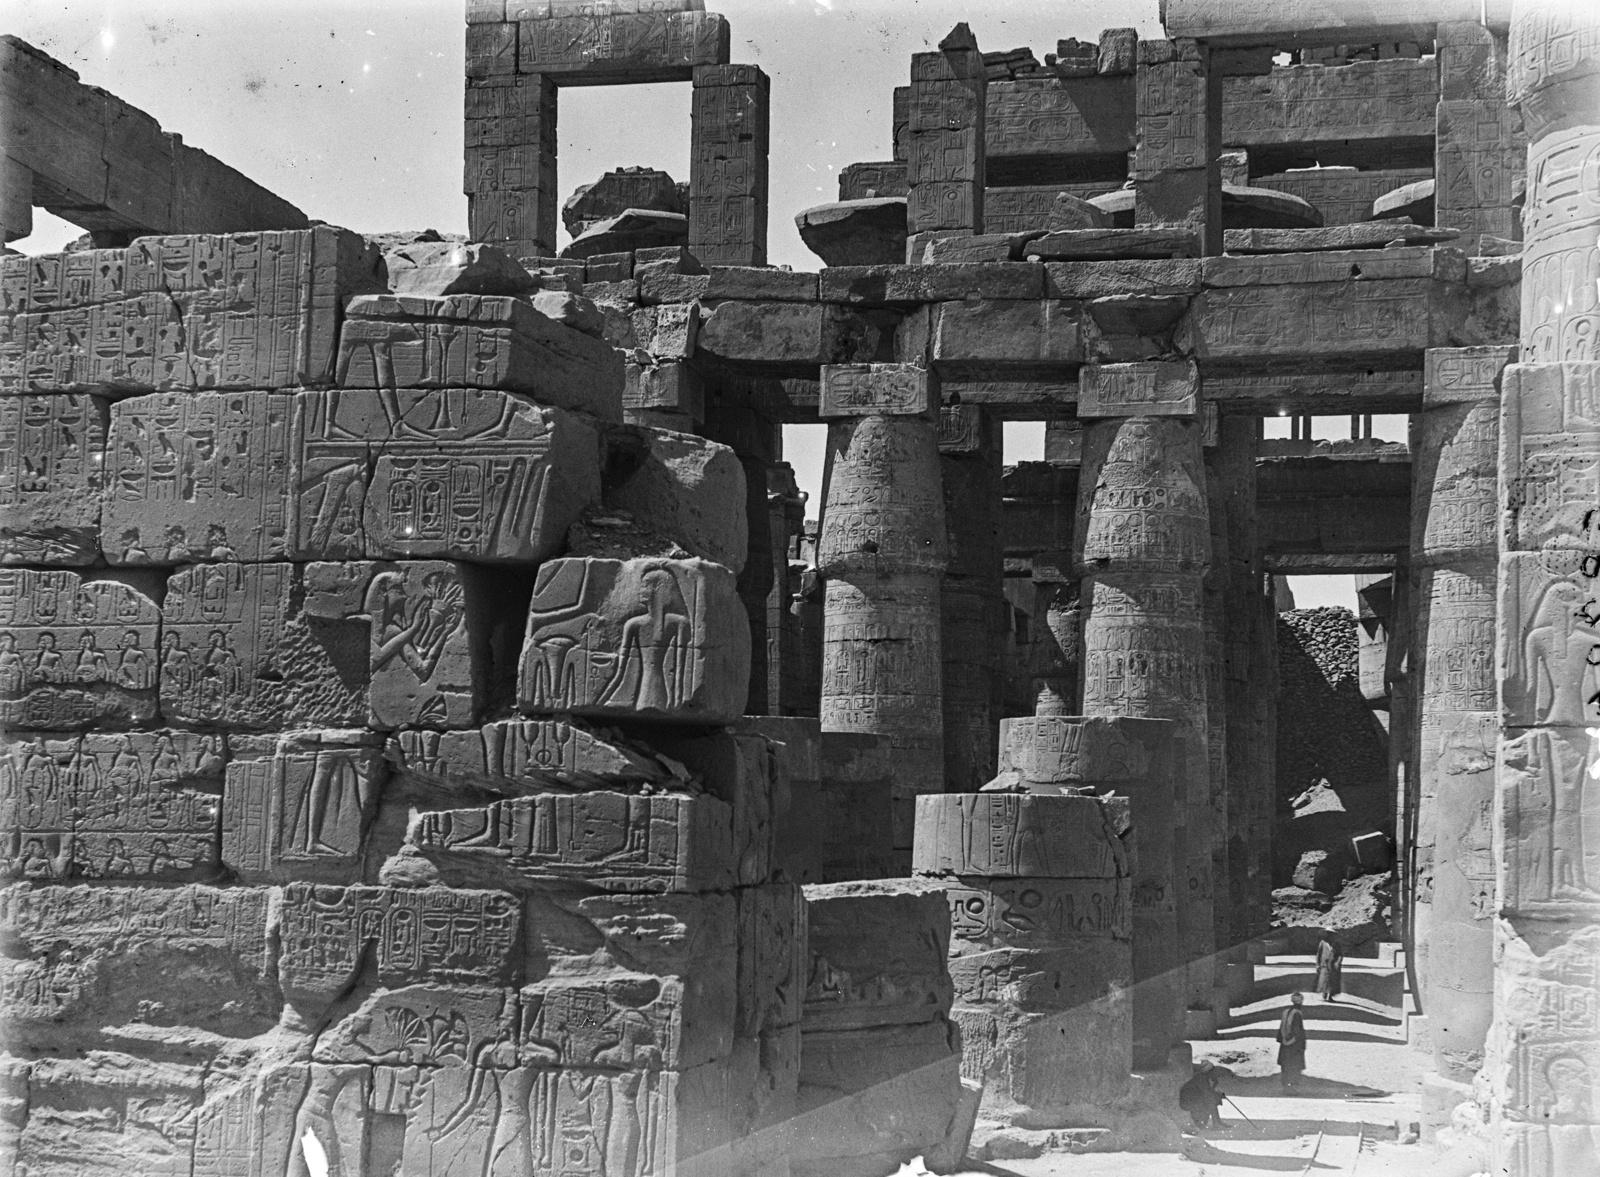 Карнак. Каменная стена с иероглифами в храмовом комплексе